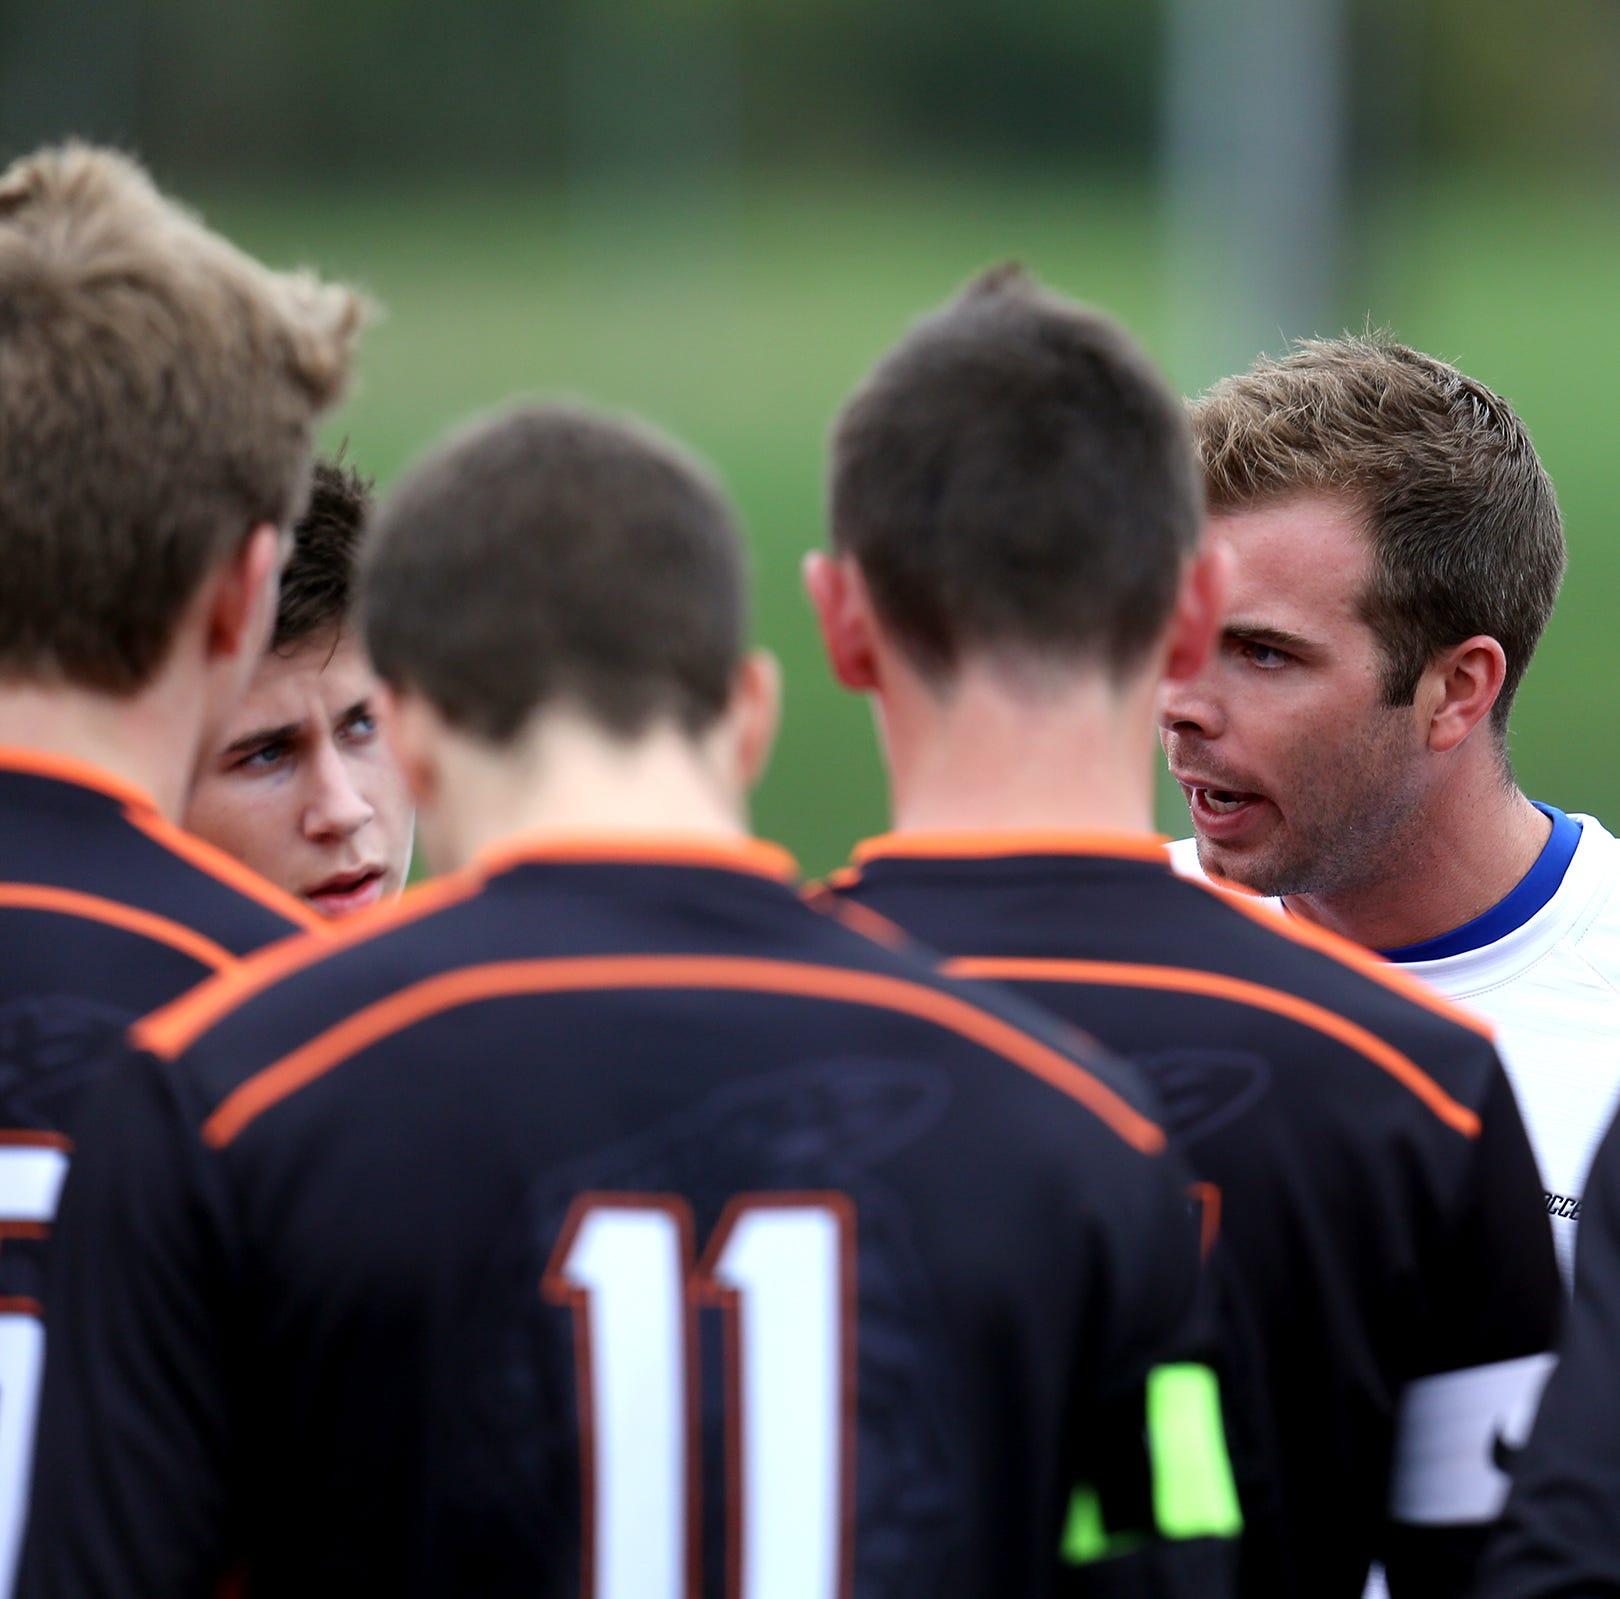 Wyoming High School tabs former Anderson, Thomas More coach Adam Jones to lead boys soccer